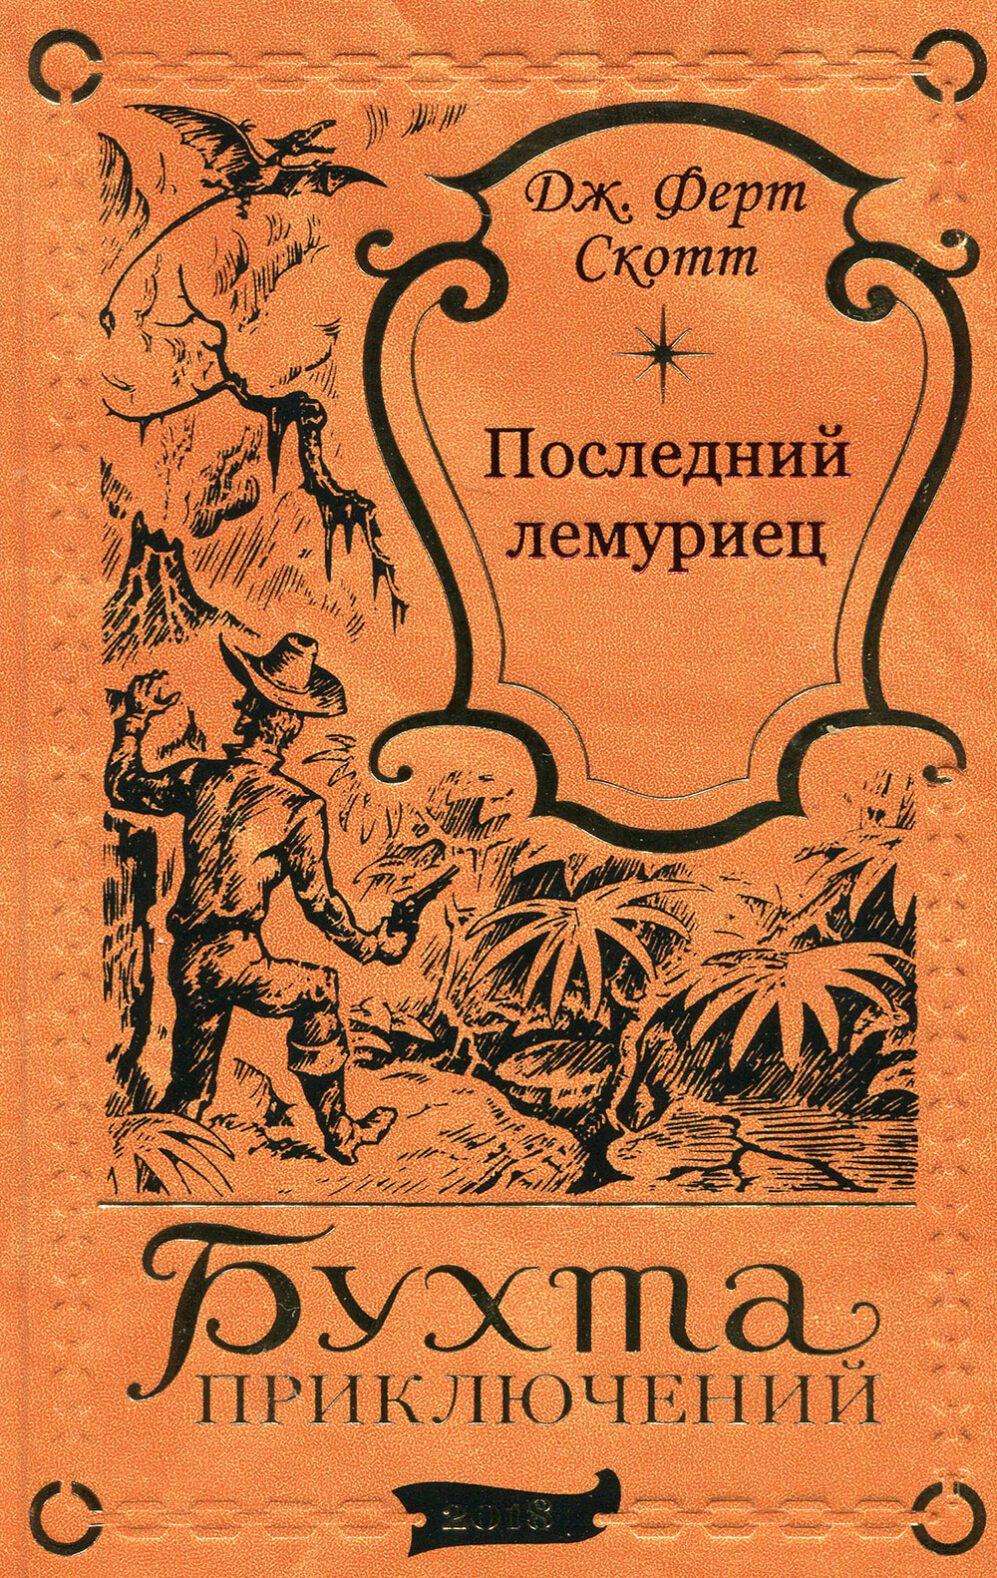 Джордж Ф. Скотт «ПОСЛЕДНИЙ ЛЕМУРИЕЦ»-0